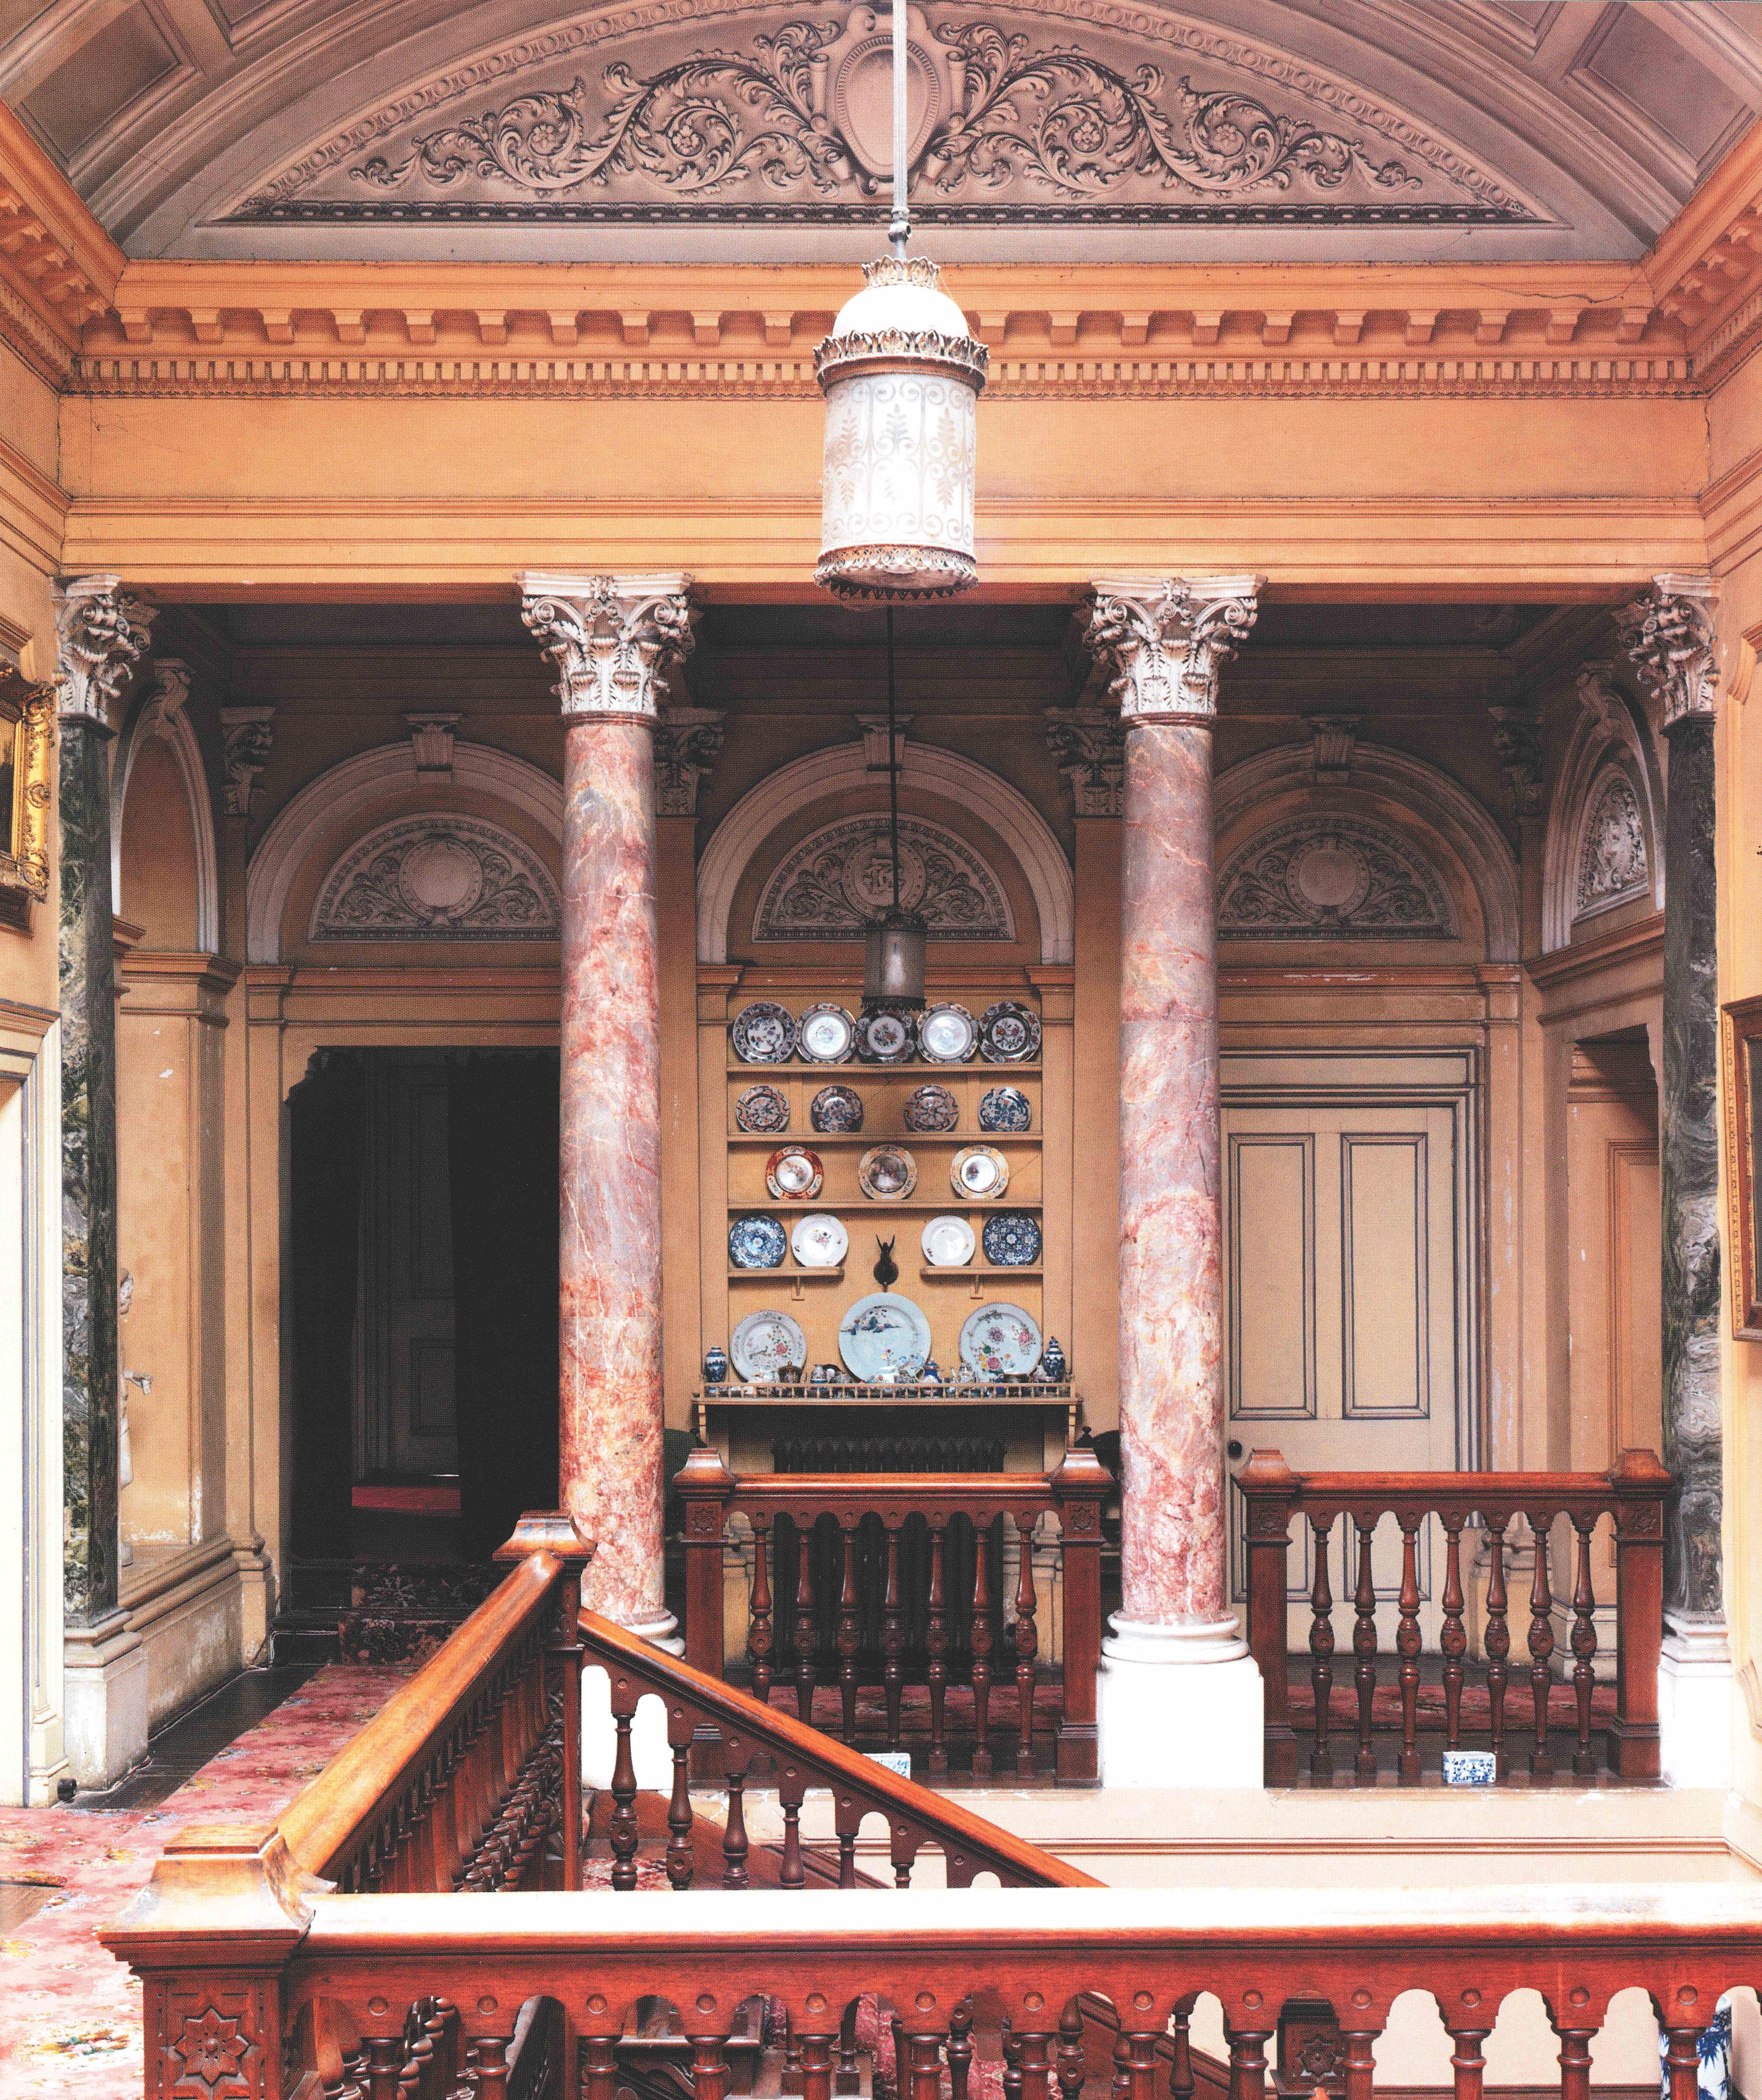 The Staircase at Stradbally Hall. © CICO Books 2009 Simon Brown